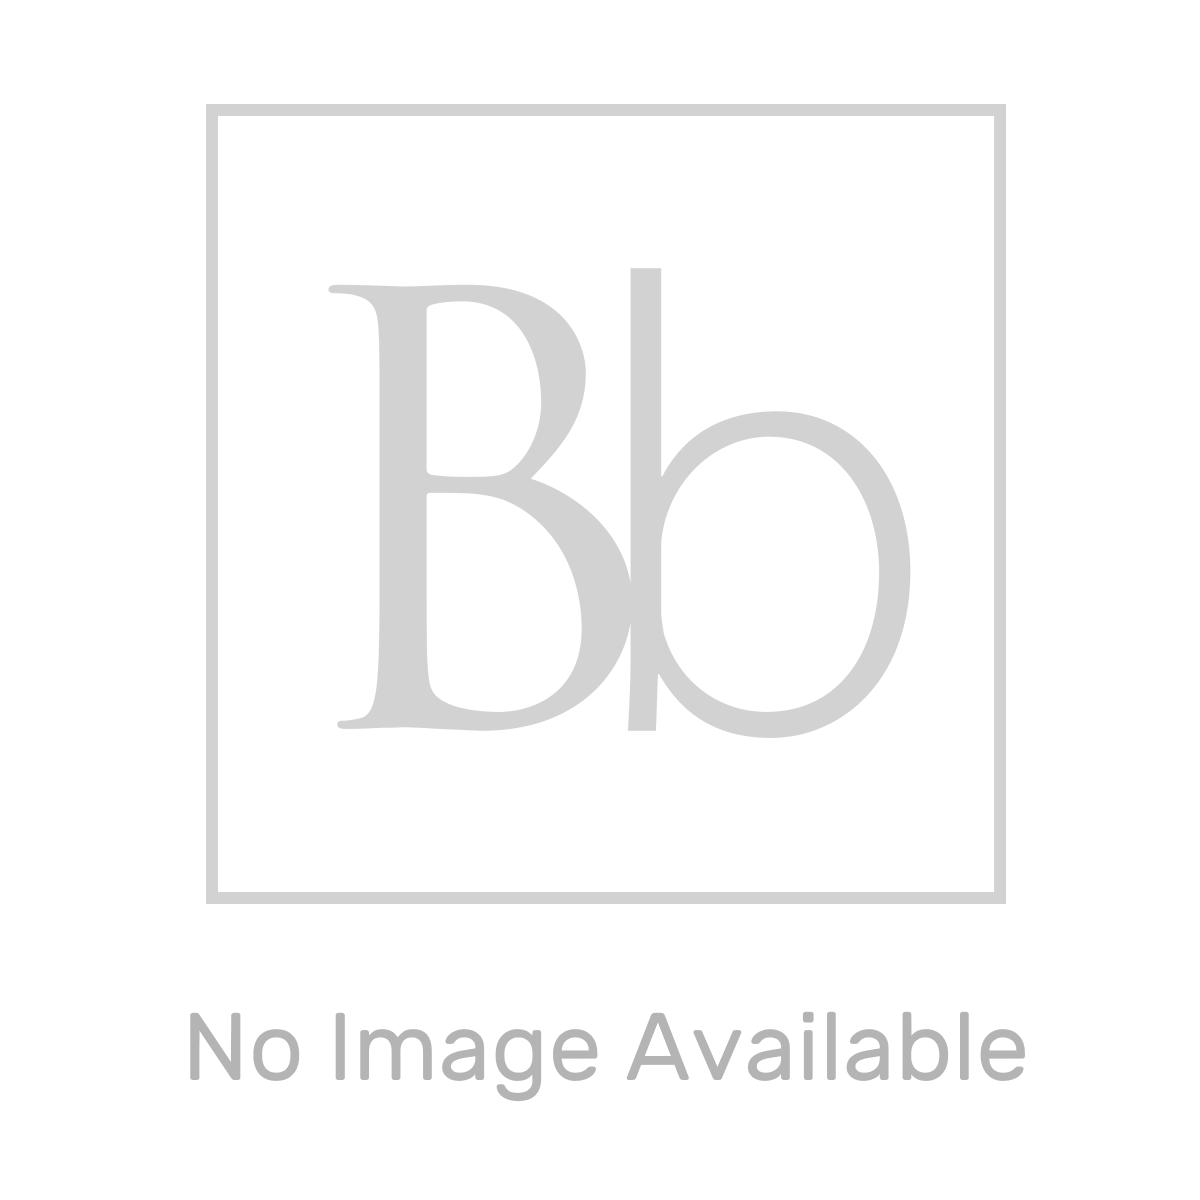 RAK Series 600 Short Projection Toilet 600mm Cistern